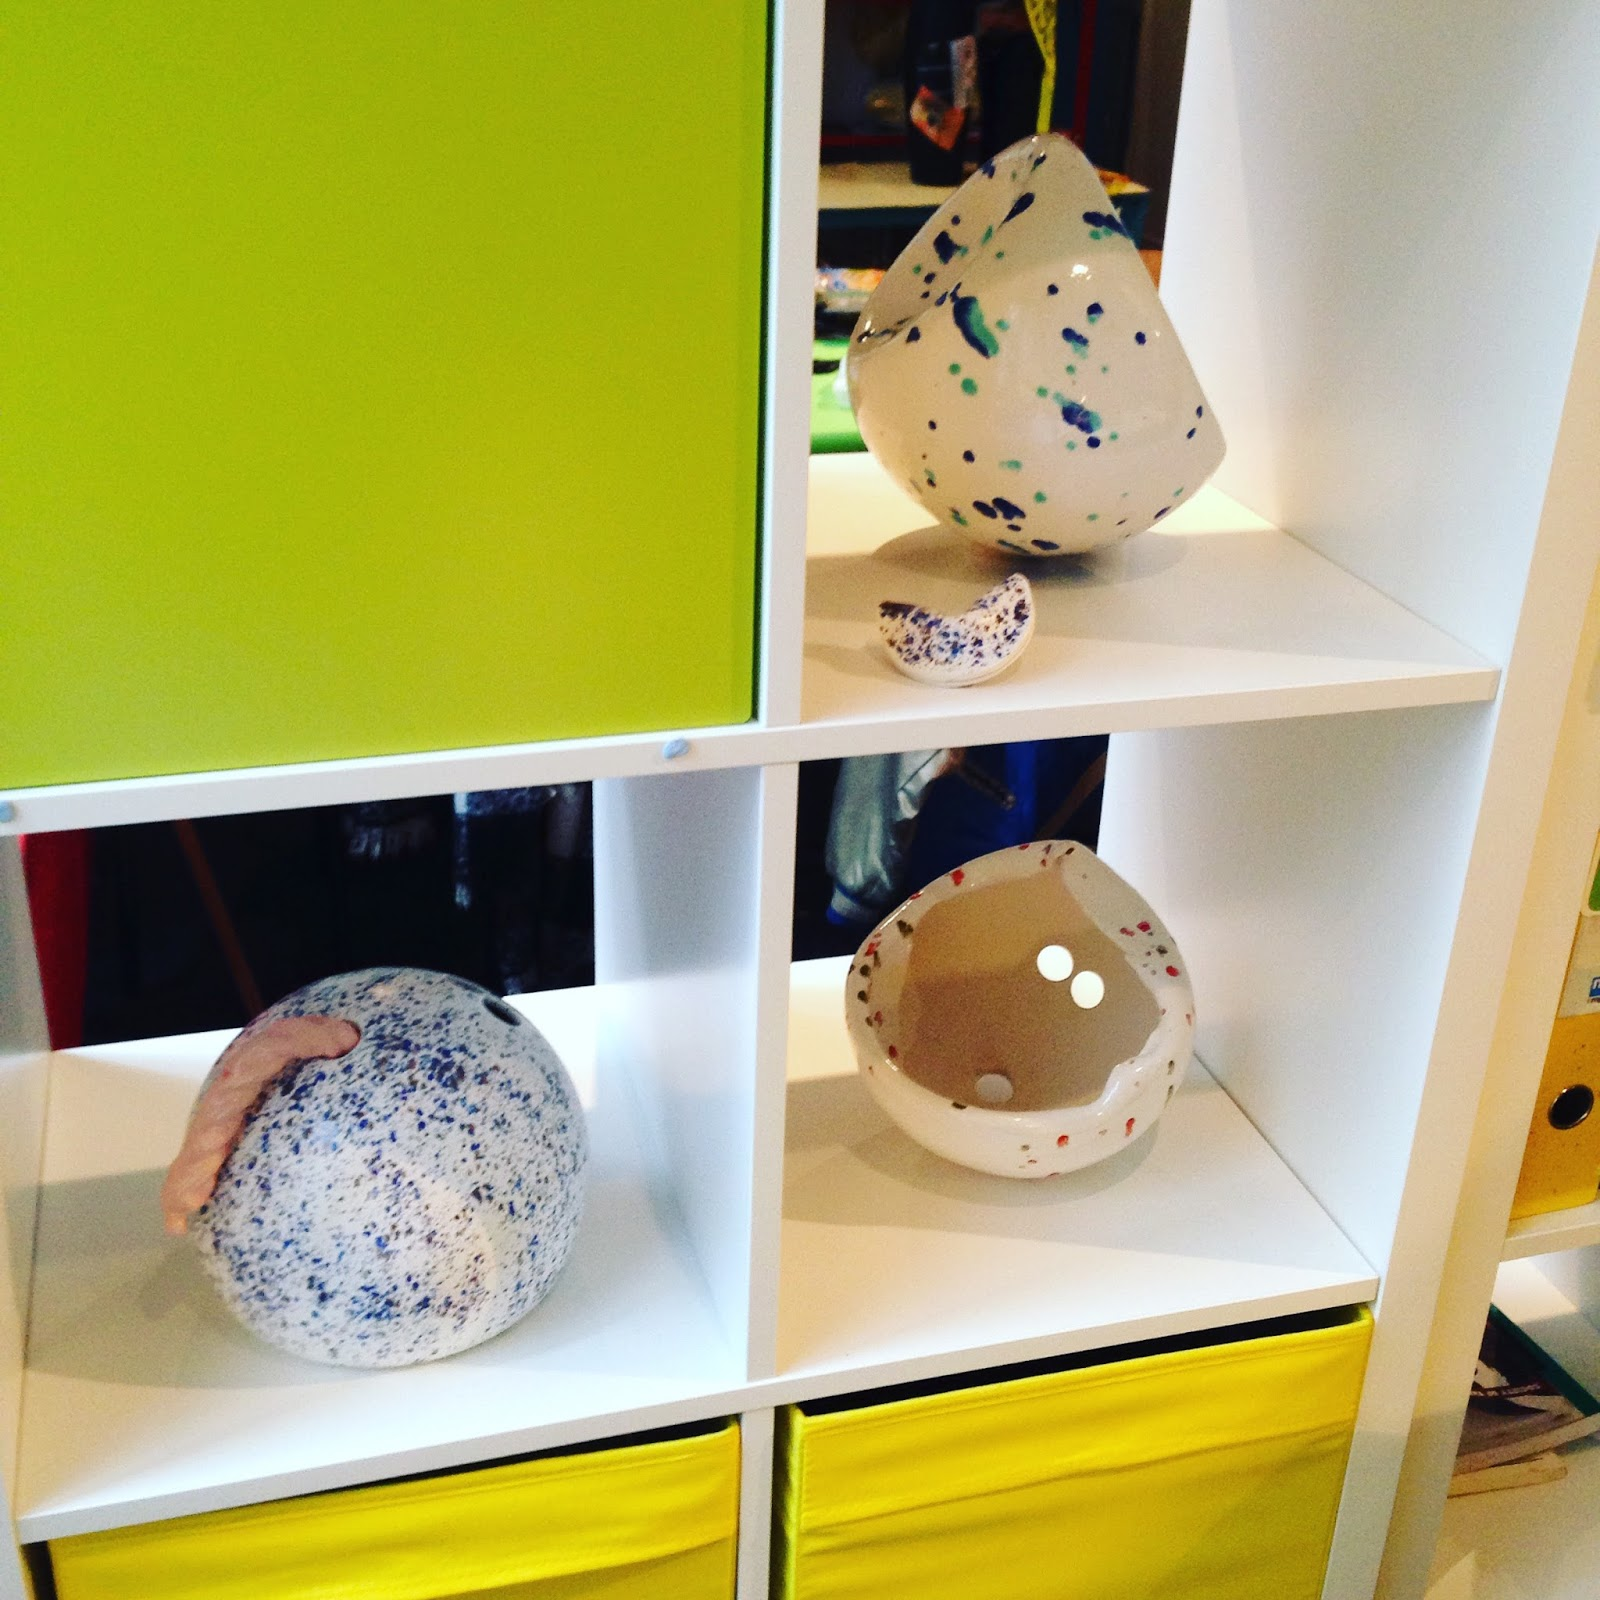 Ceramics by Paloma Proudfoot